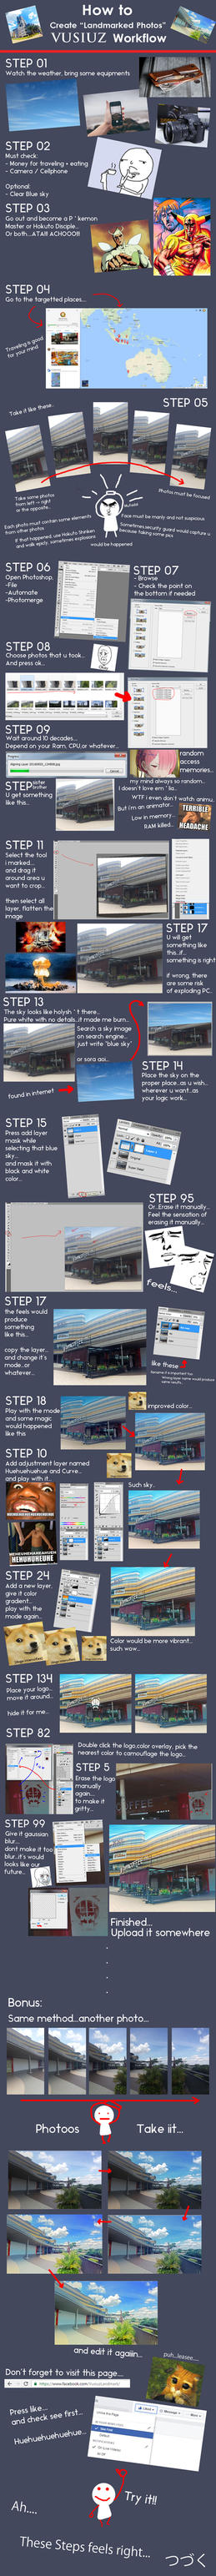 Vusiuz Workflow: How to Create Landmarked Photos! by Vusiuz